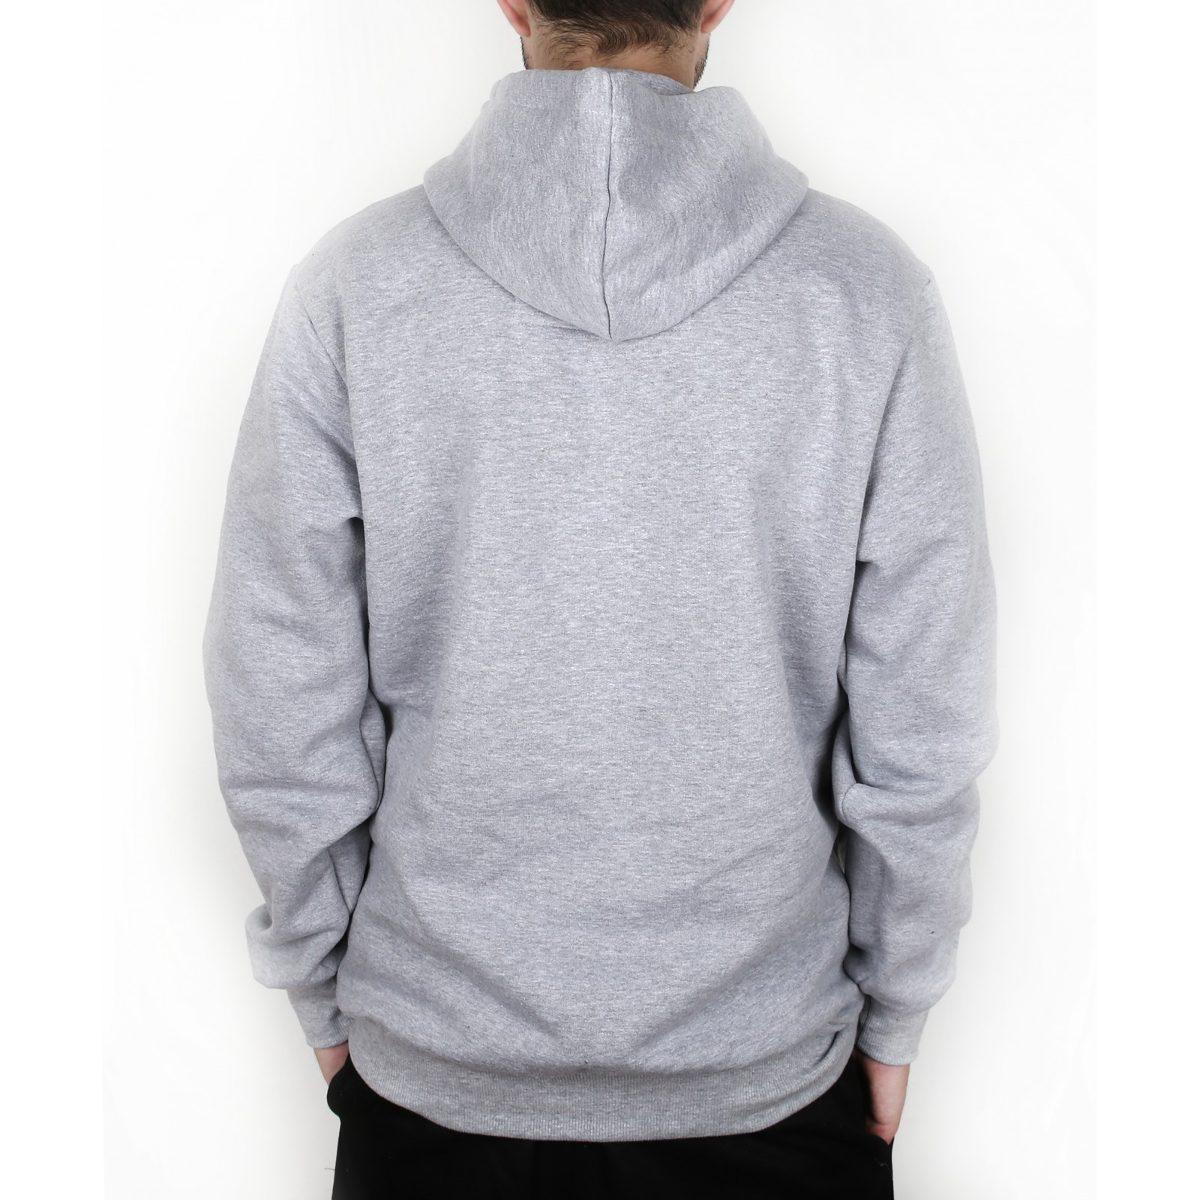 blusa moletom fluminense futebol casaco moleton frio. Carregando zoom. f0824db98cfe6